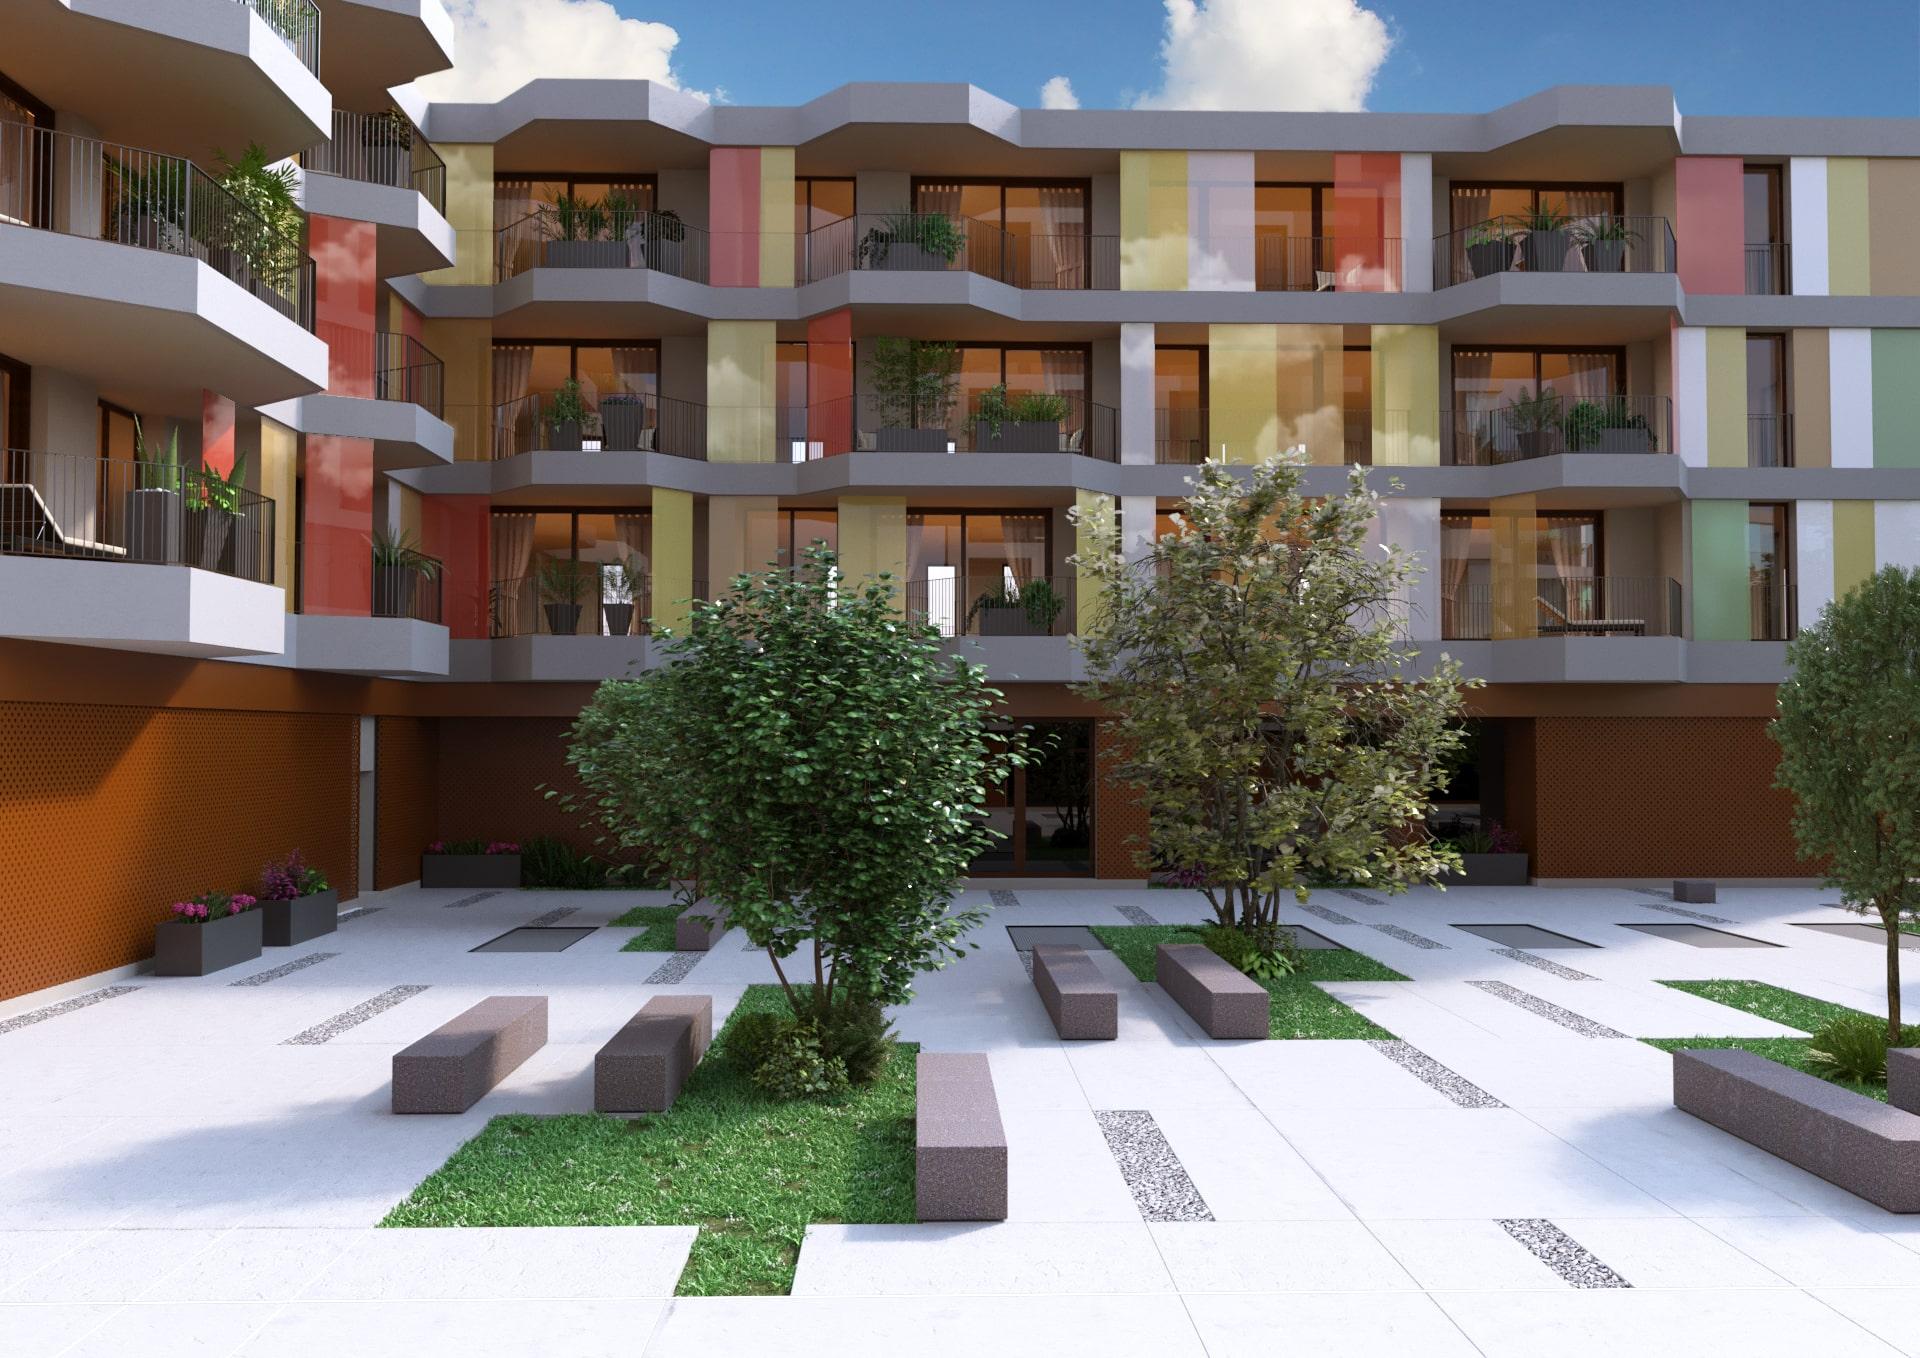 Rendering Complesso residenziale   Rendering Esterni